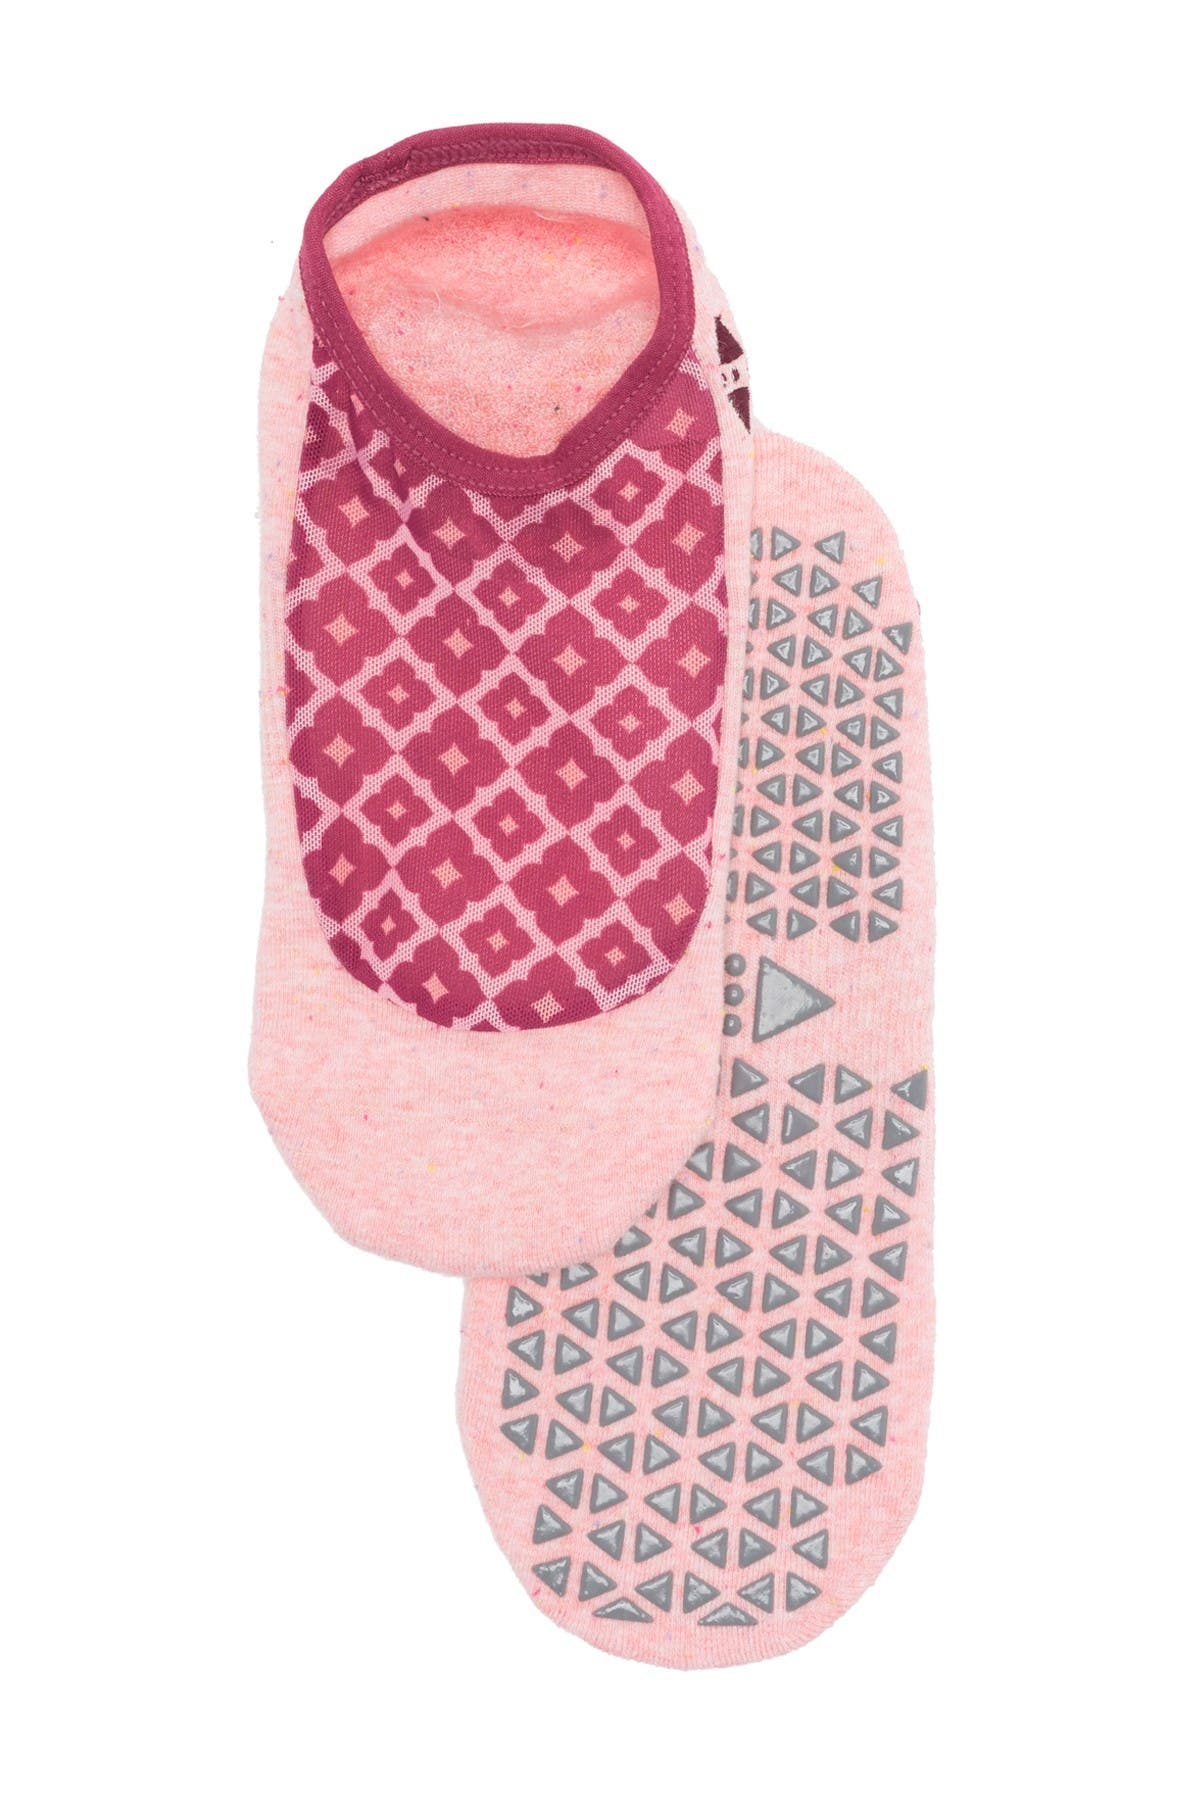 Image of Tavi Noir Maddie Marrakesh Floral Print No-Show Socks